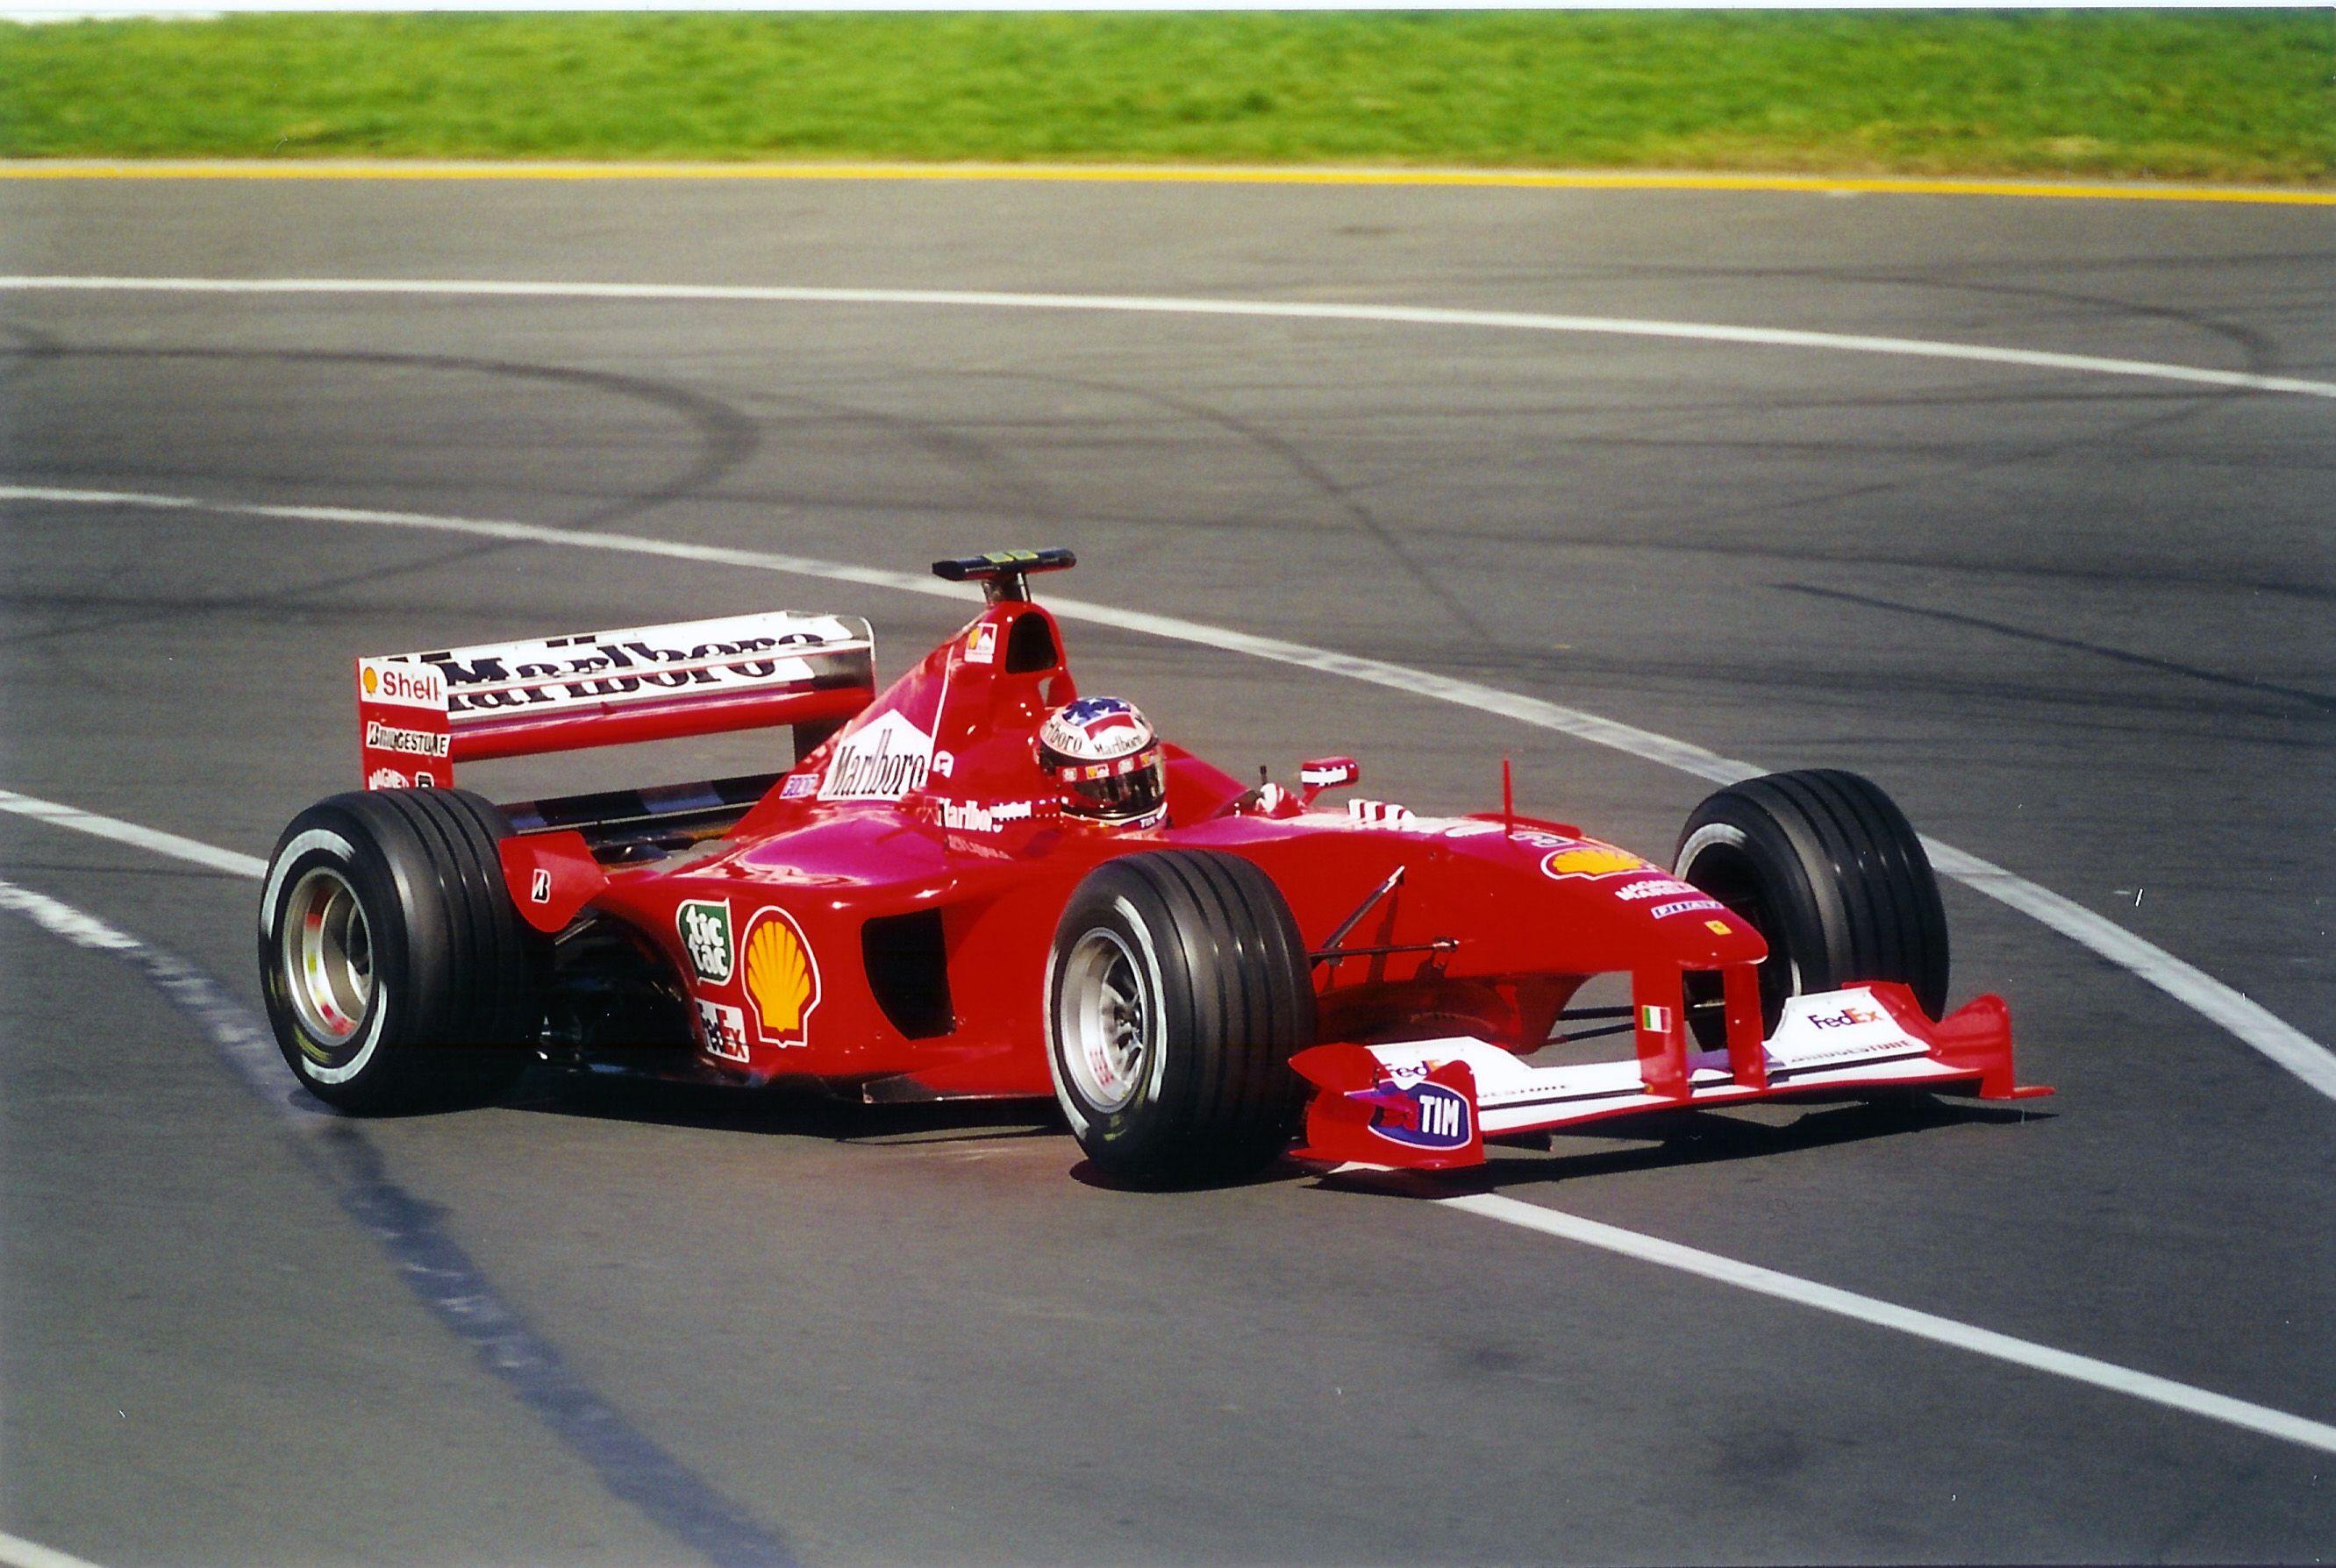 2000 Michael Schumacher Ferrari F1-2000(画像あり)